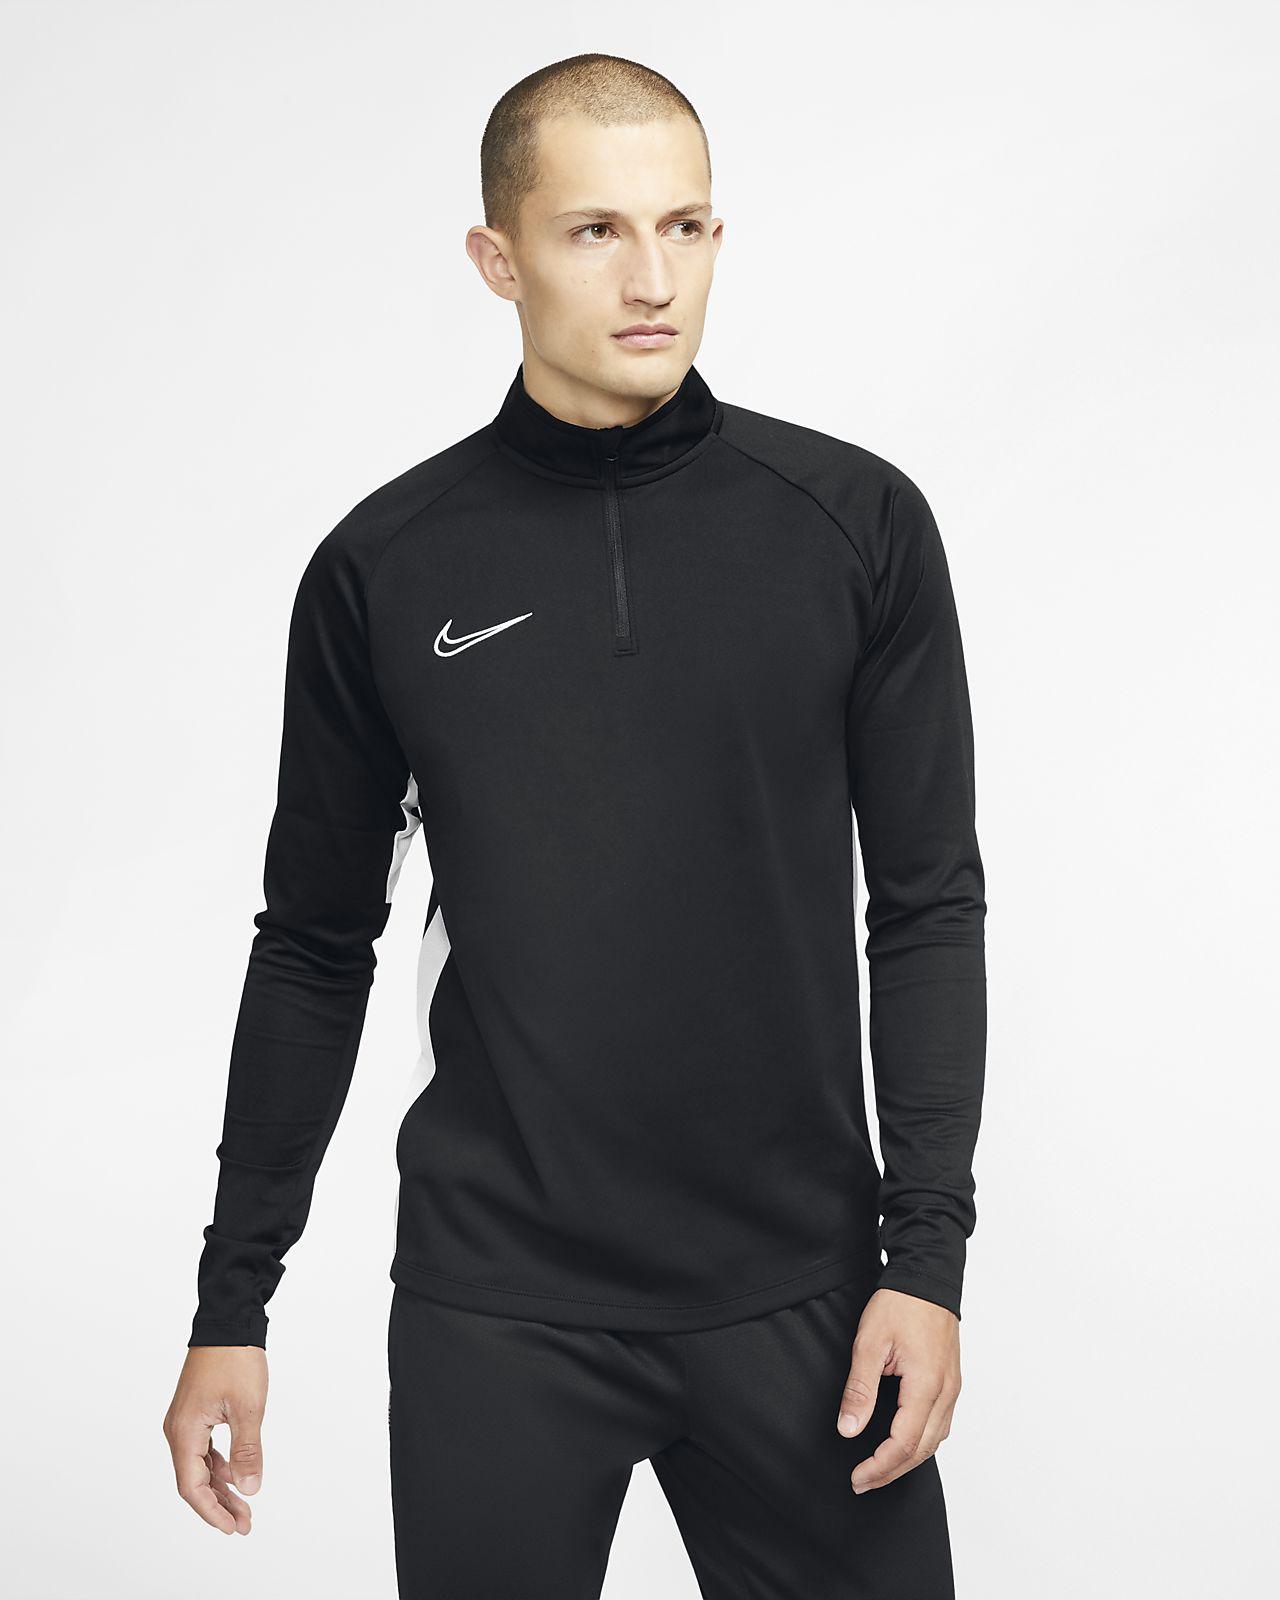 Nike Dri-FIT Academy Men's Soccer Drill Top